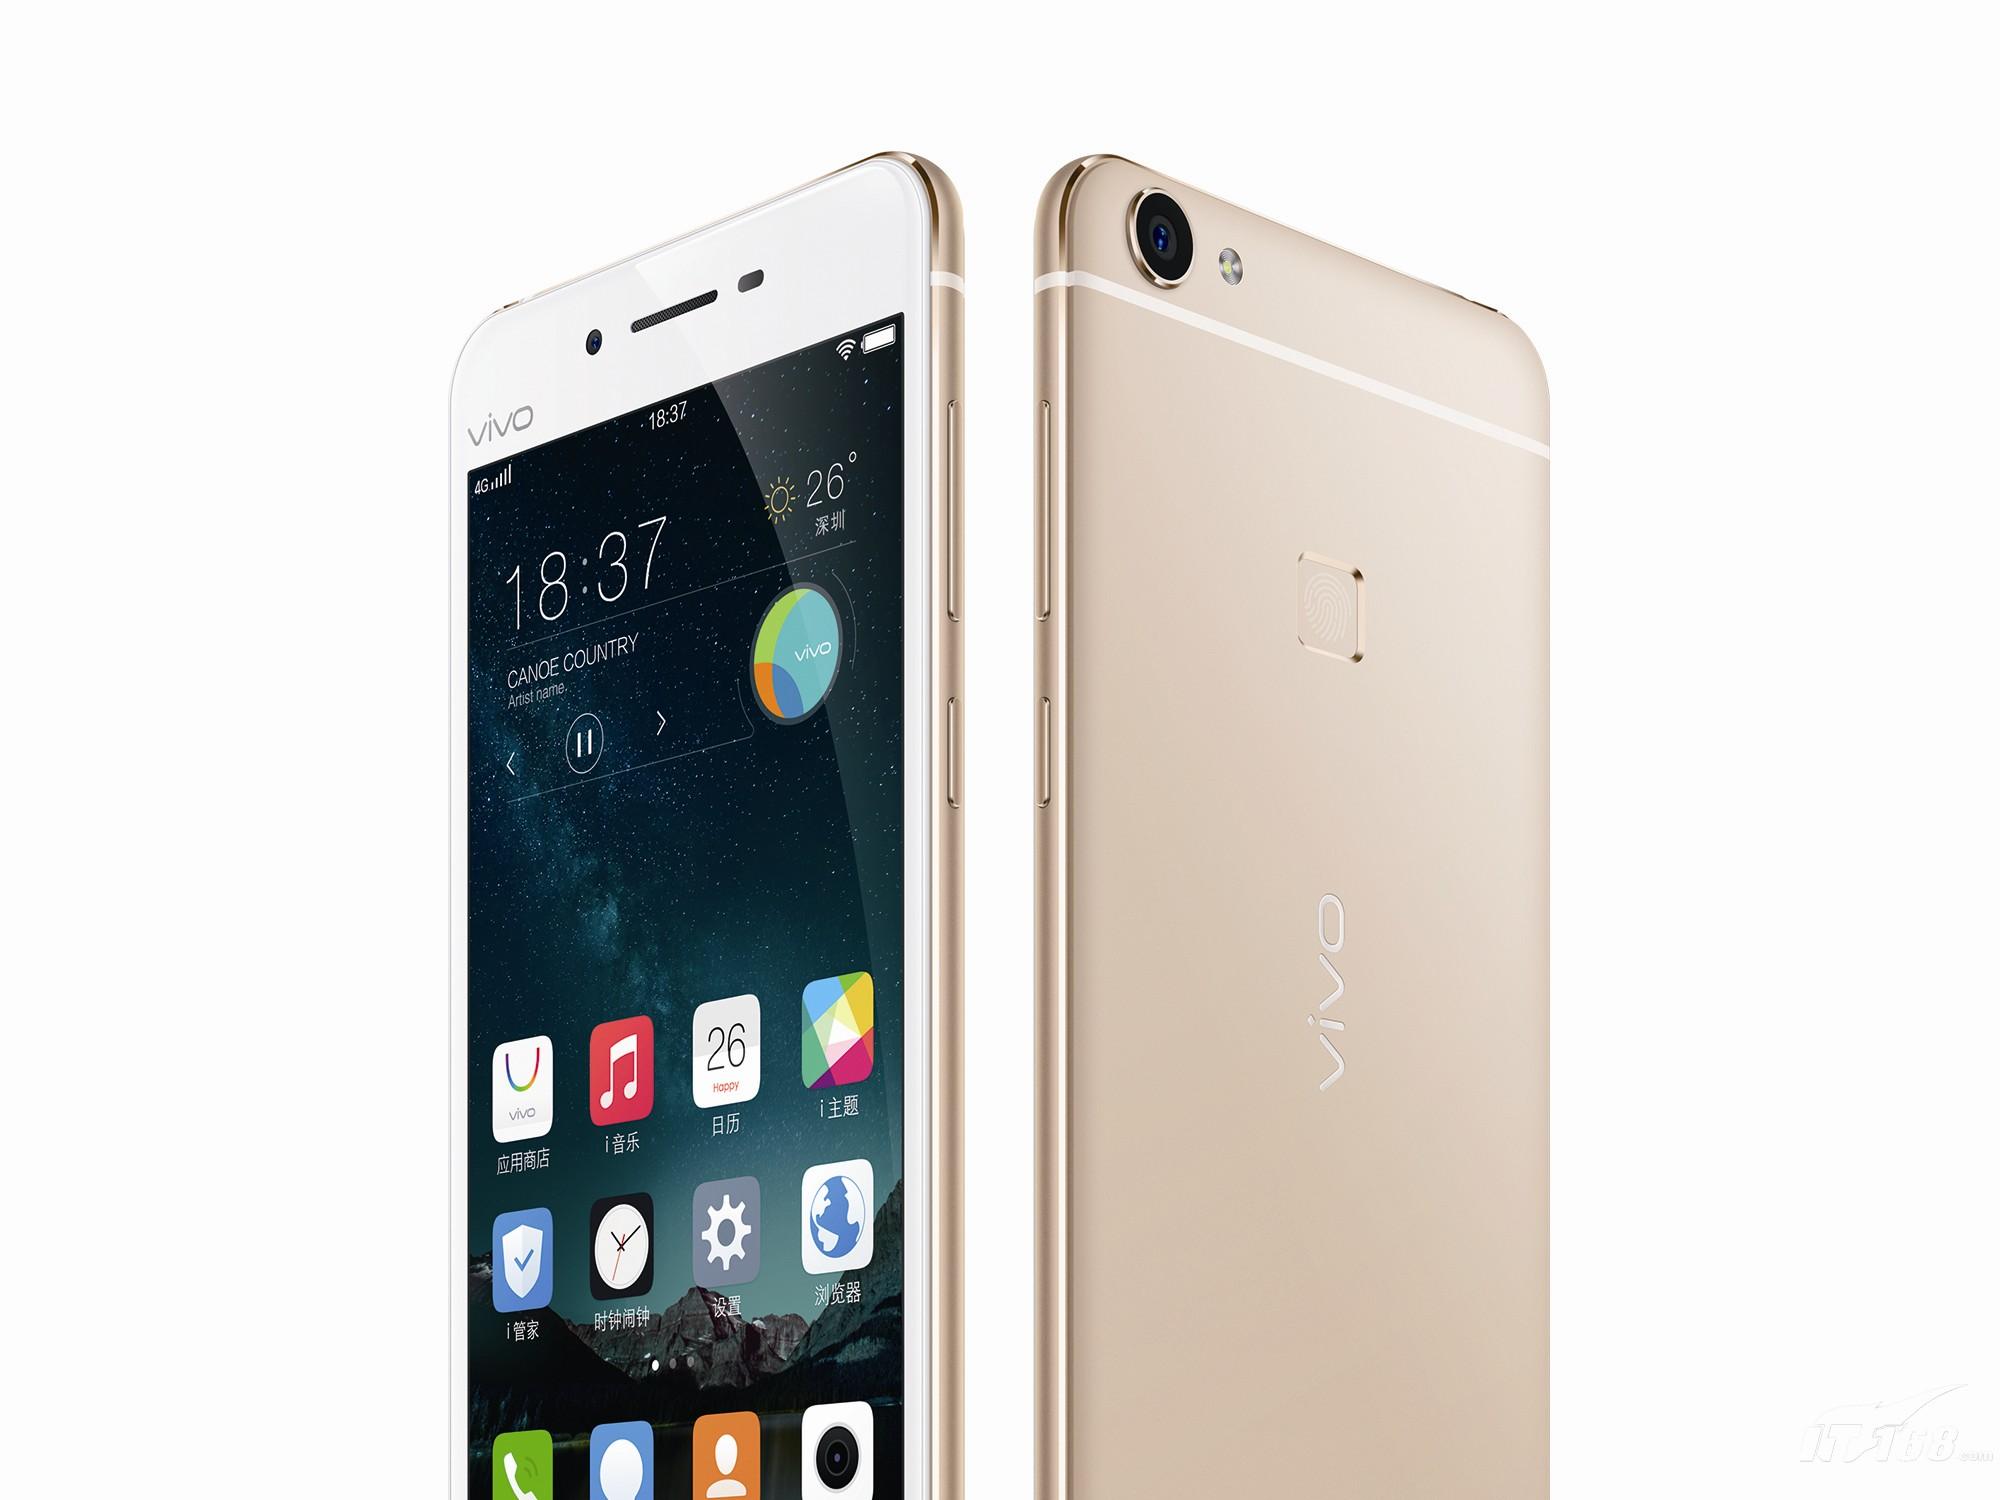 vivox6 全网通 金色手机产品图片5素材-it168手机图片